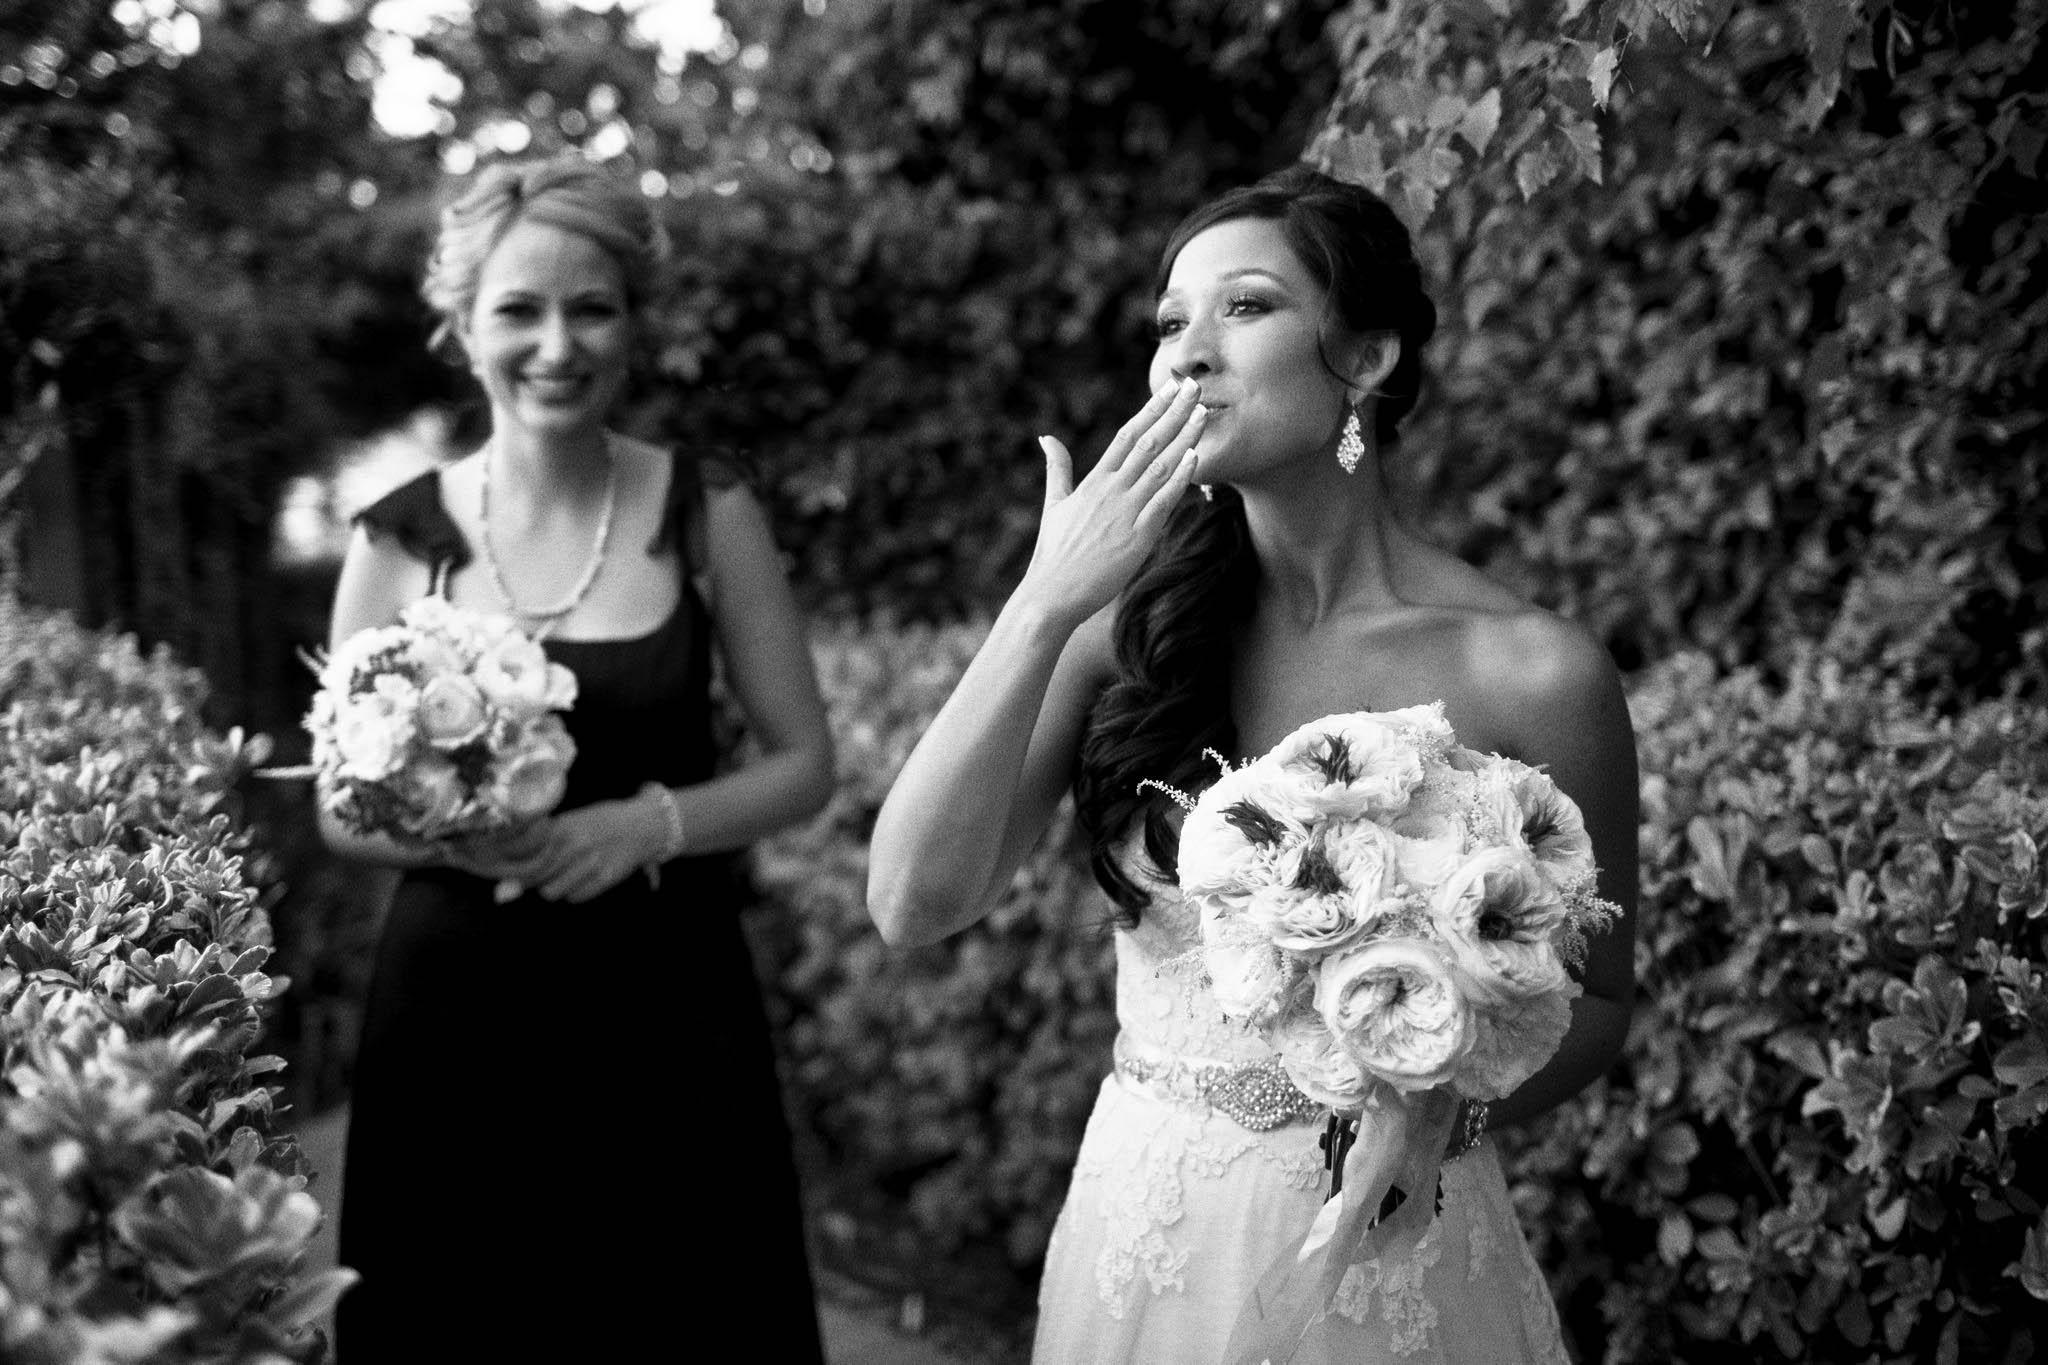 wedding-moments-anticipating-a-shot-cctj_p076.jpg